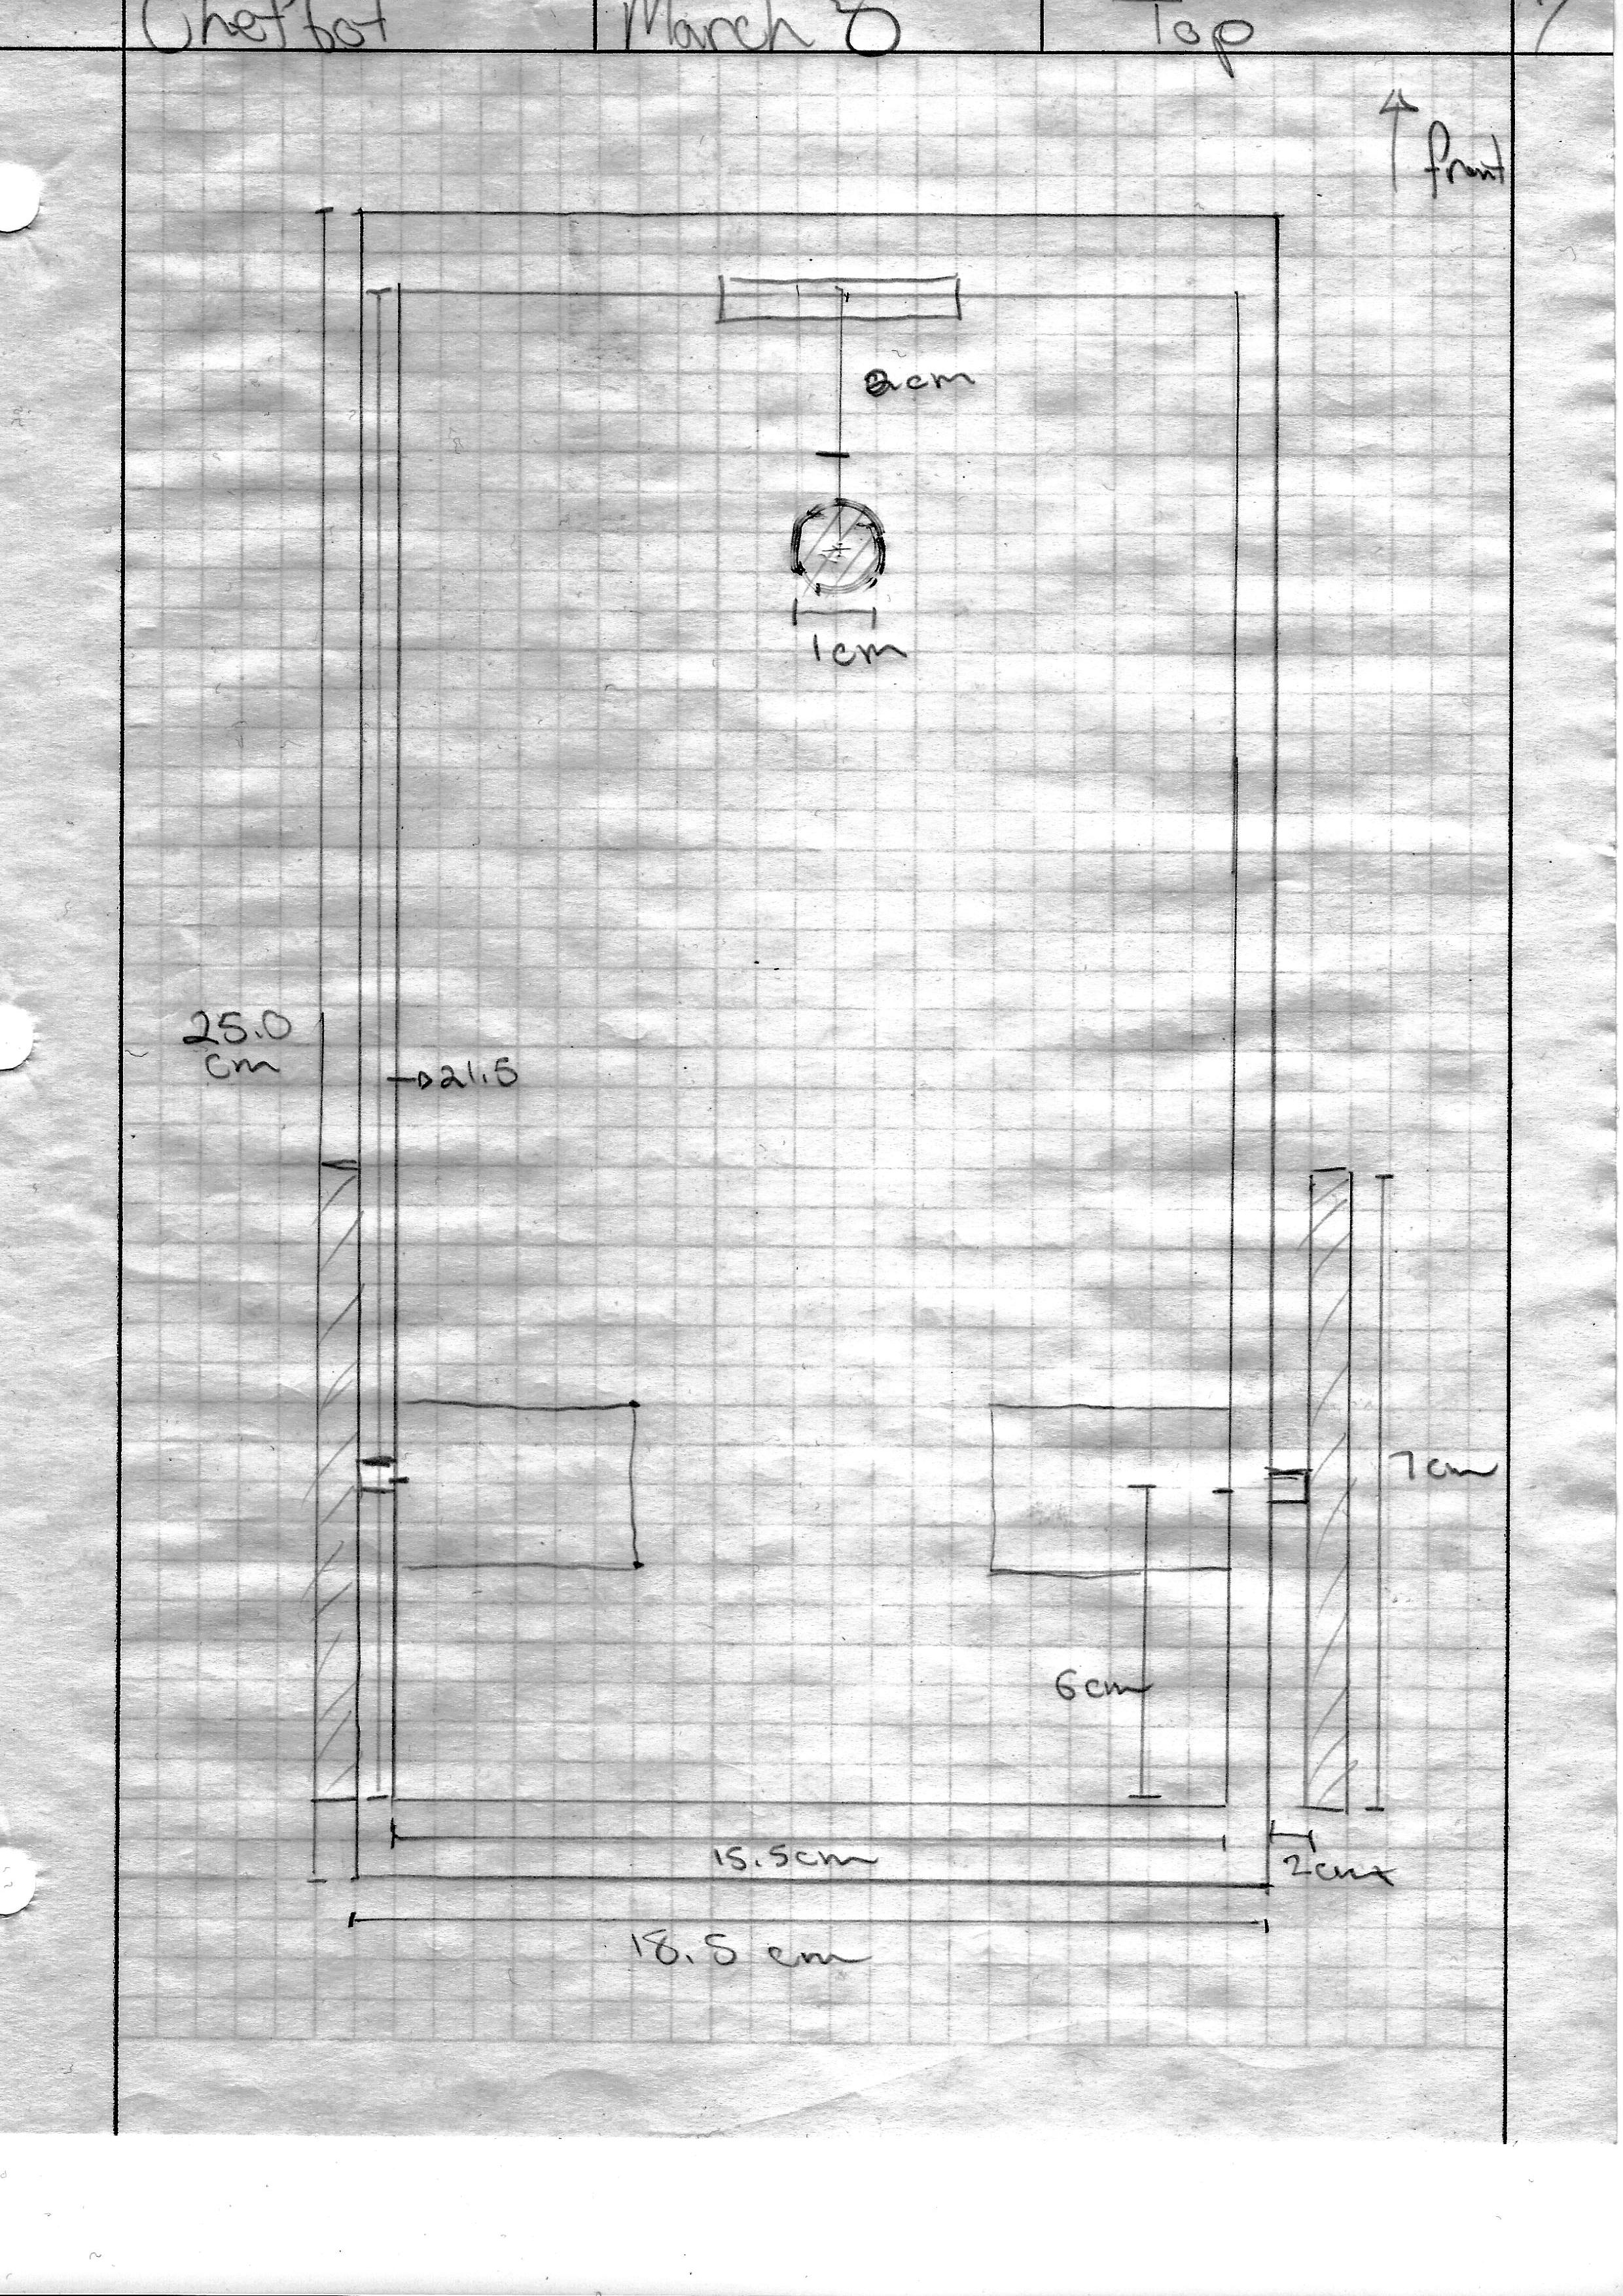 Drawing of Chefbot - 1